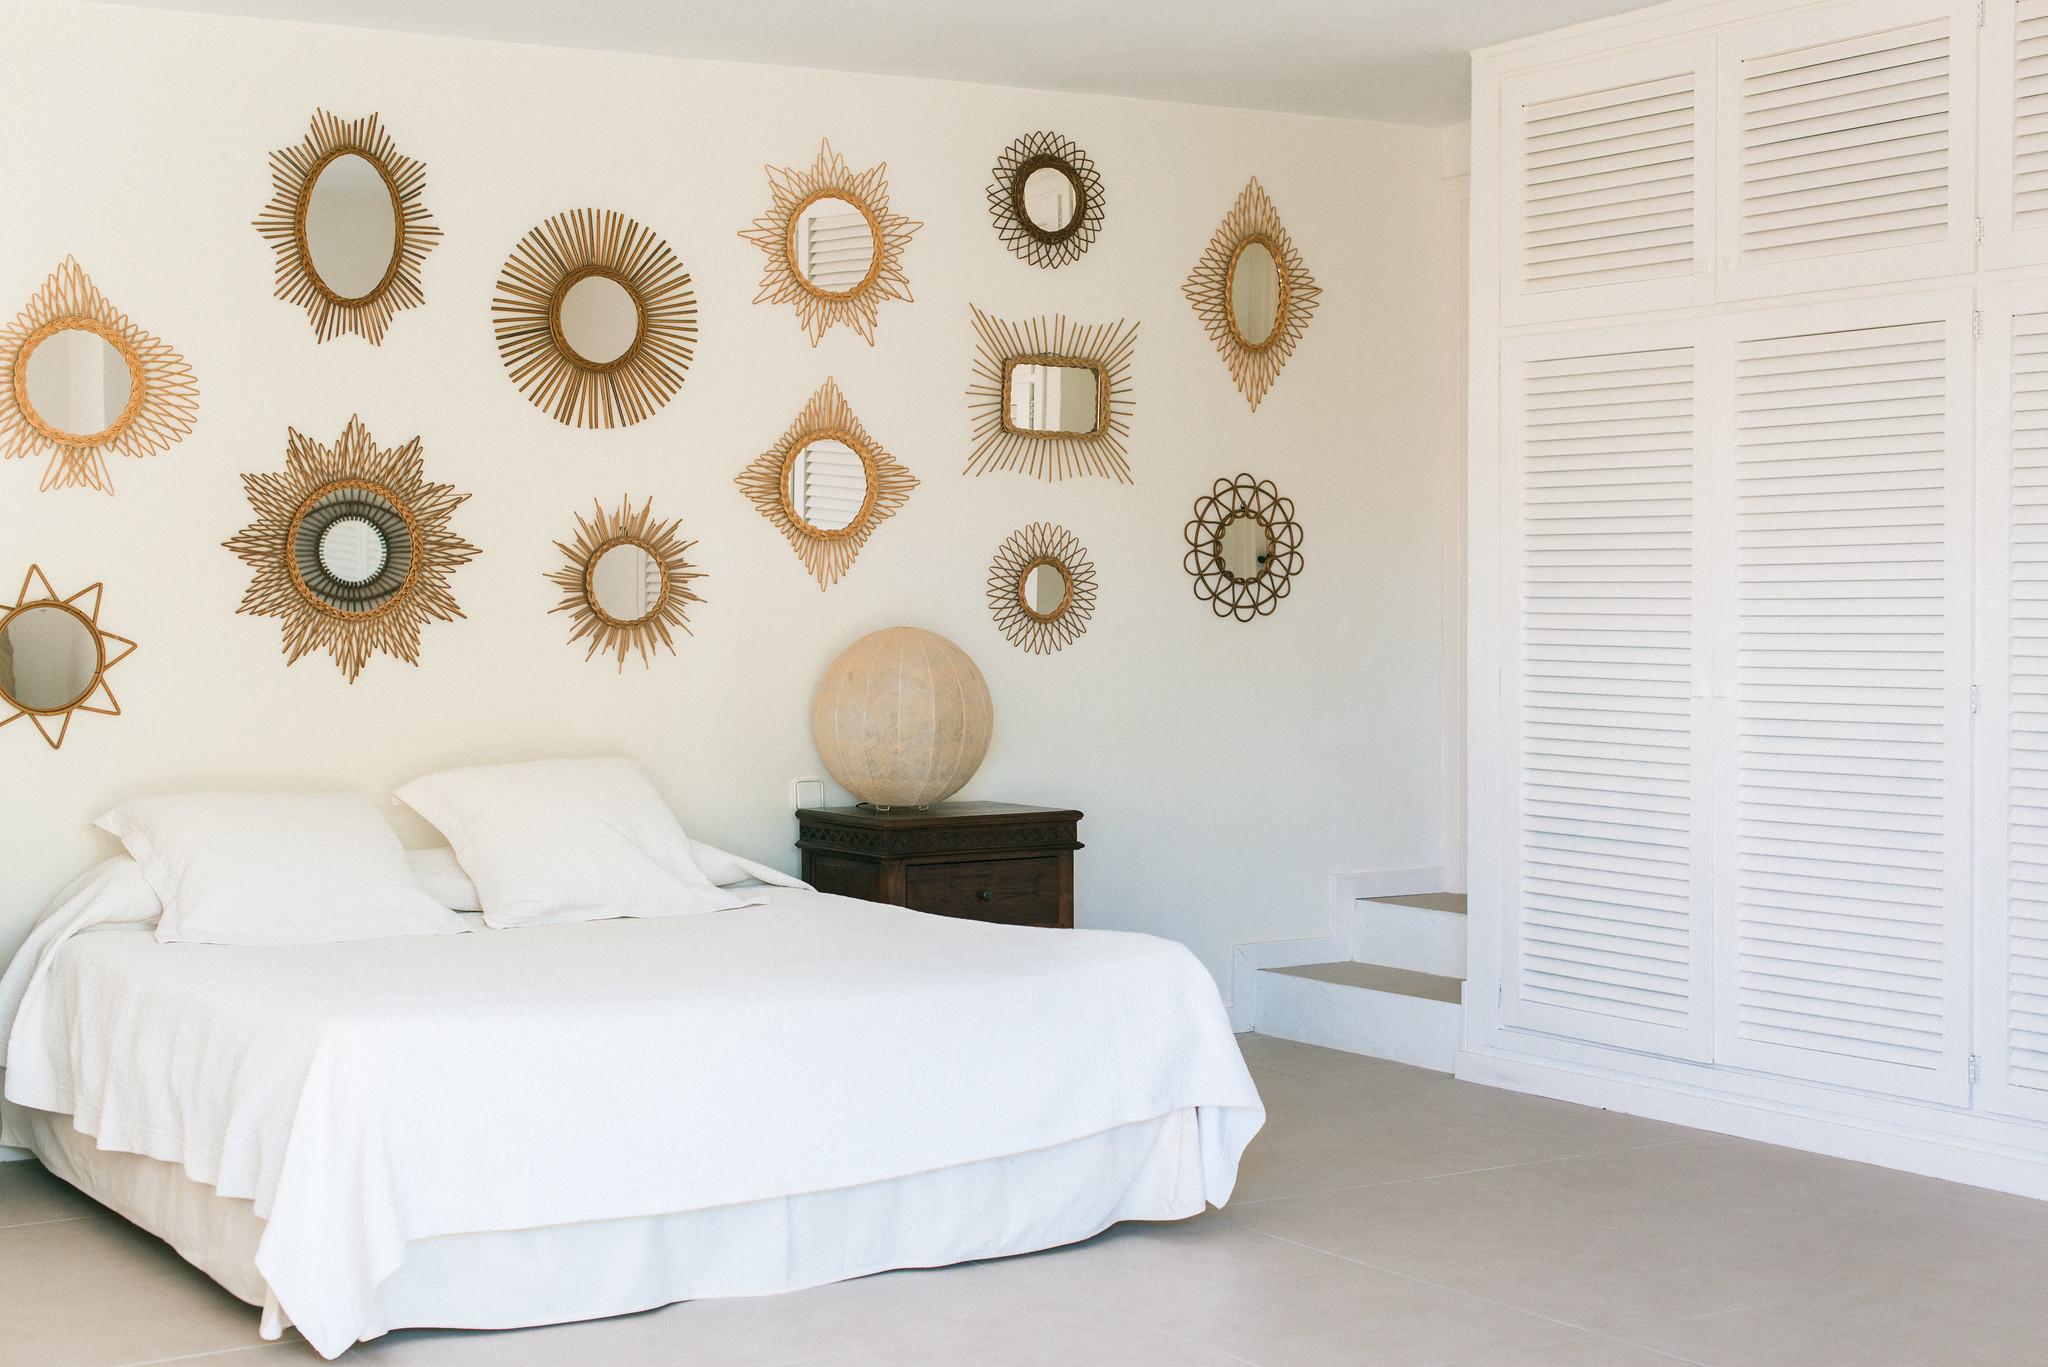 https://www.white-ibiza.com/wp-content/uploads/2020/06/white-ibiza-villas-casa-odette-interior-bedroom4.jpg